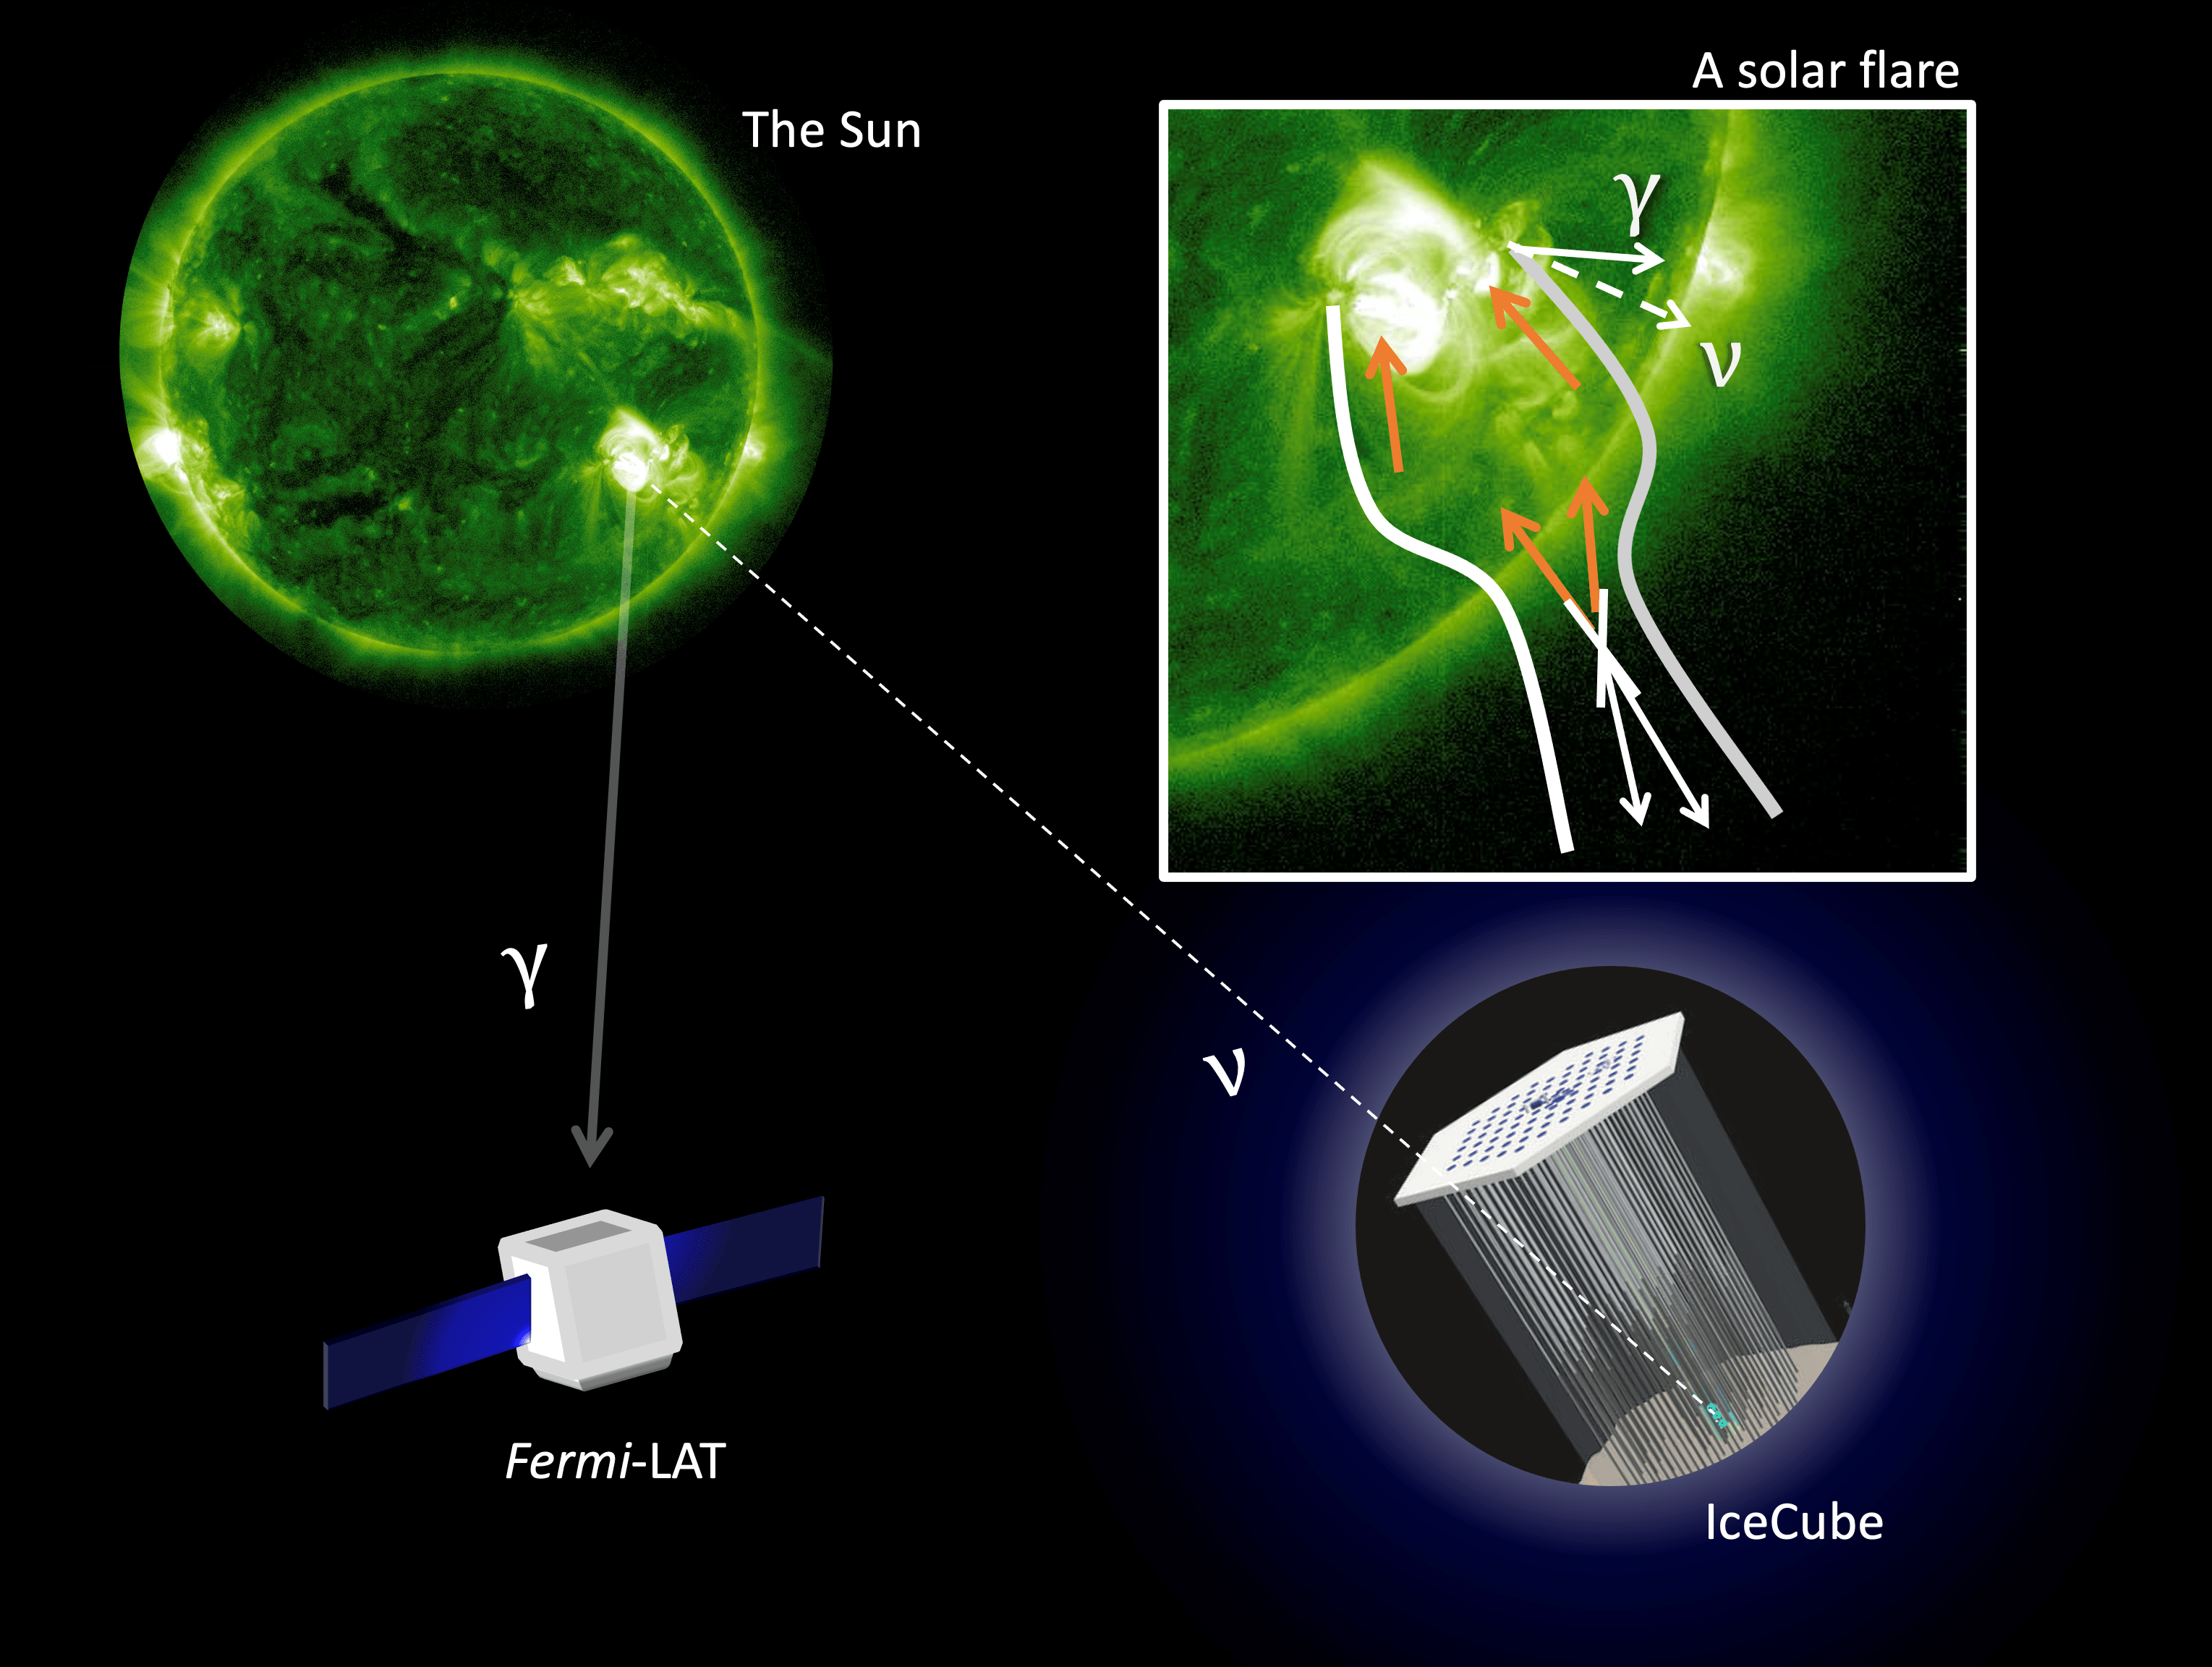 Diagram of gamma ray and neutrino production in solar flares.